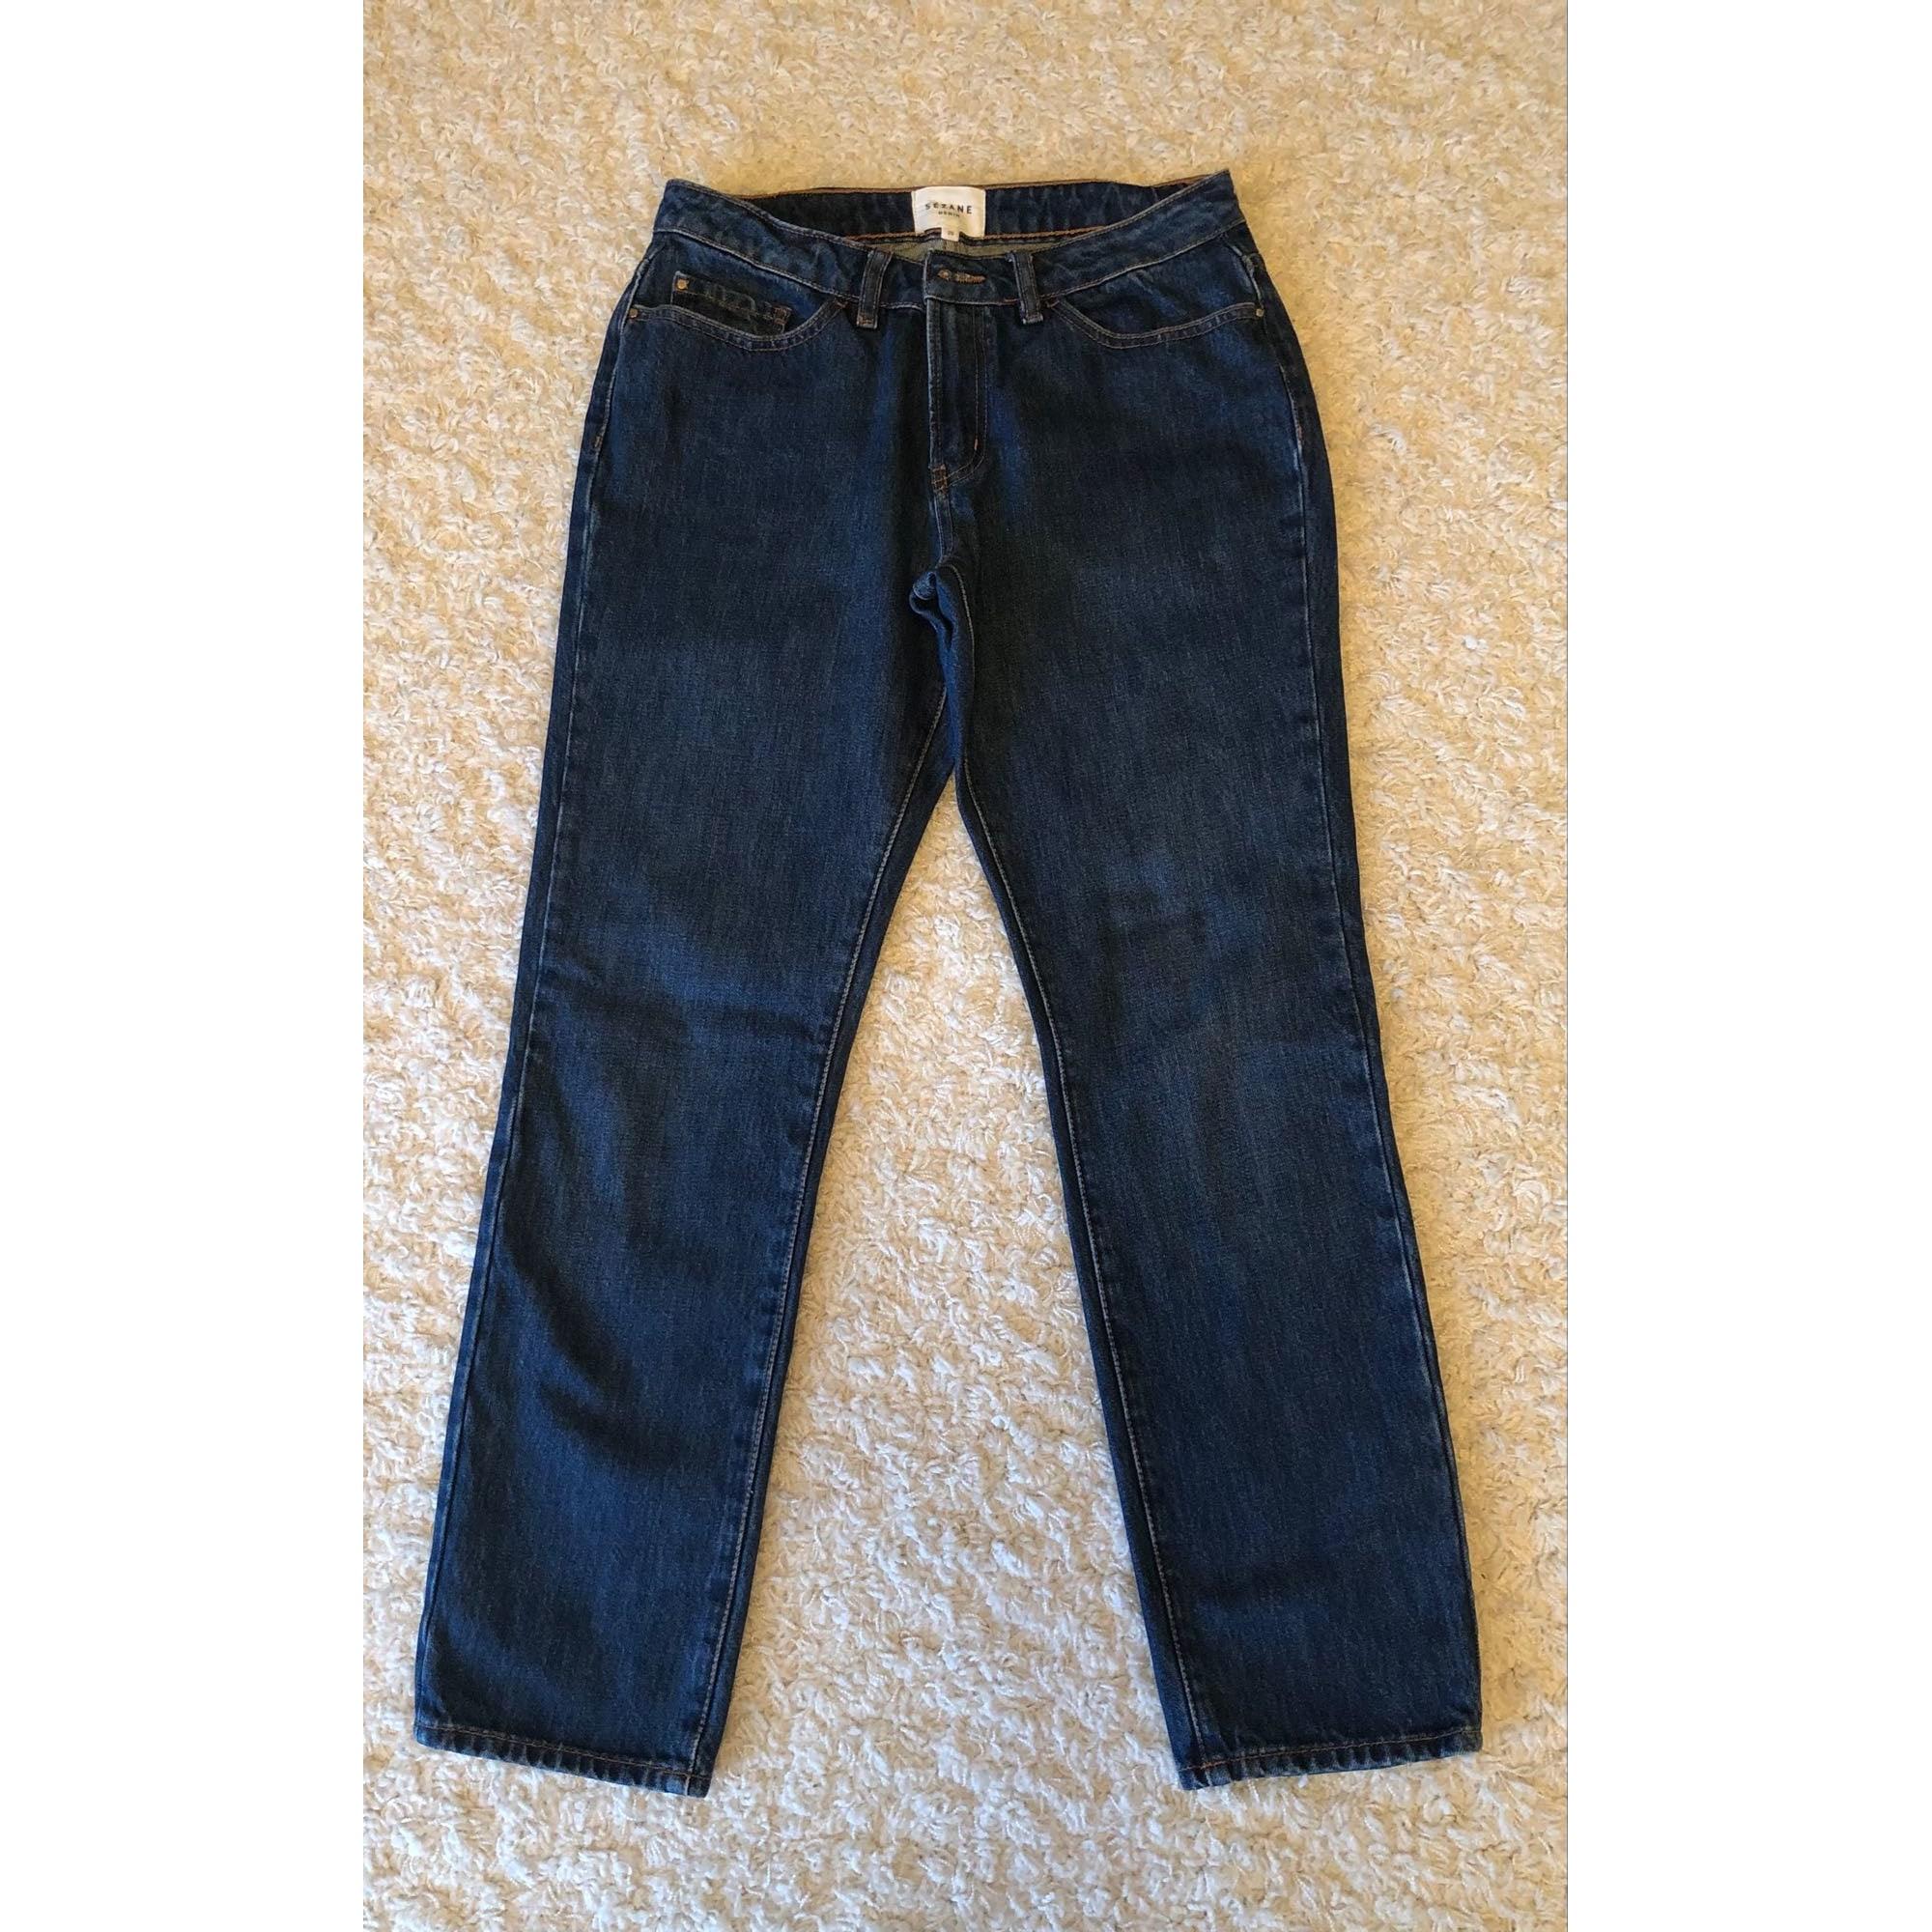 Jeans droit SÉZANE Bleu, bleu marine, bleu turquoise